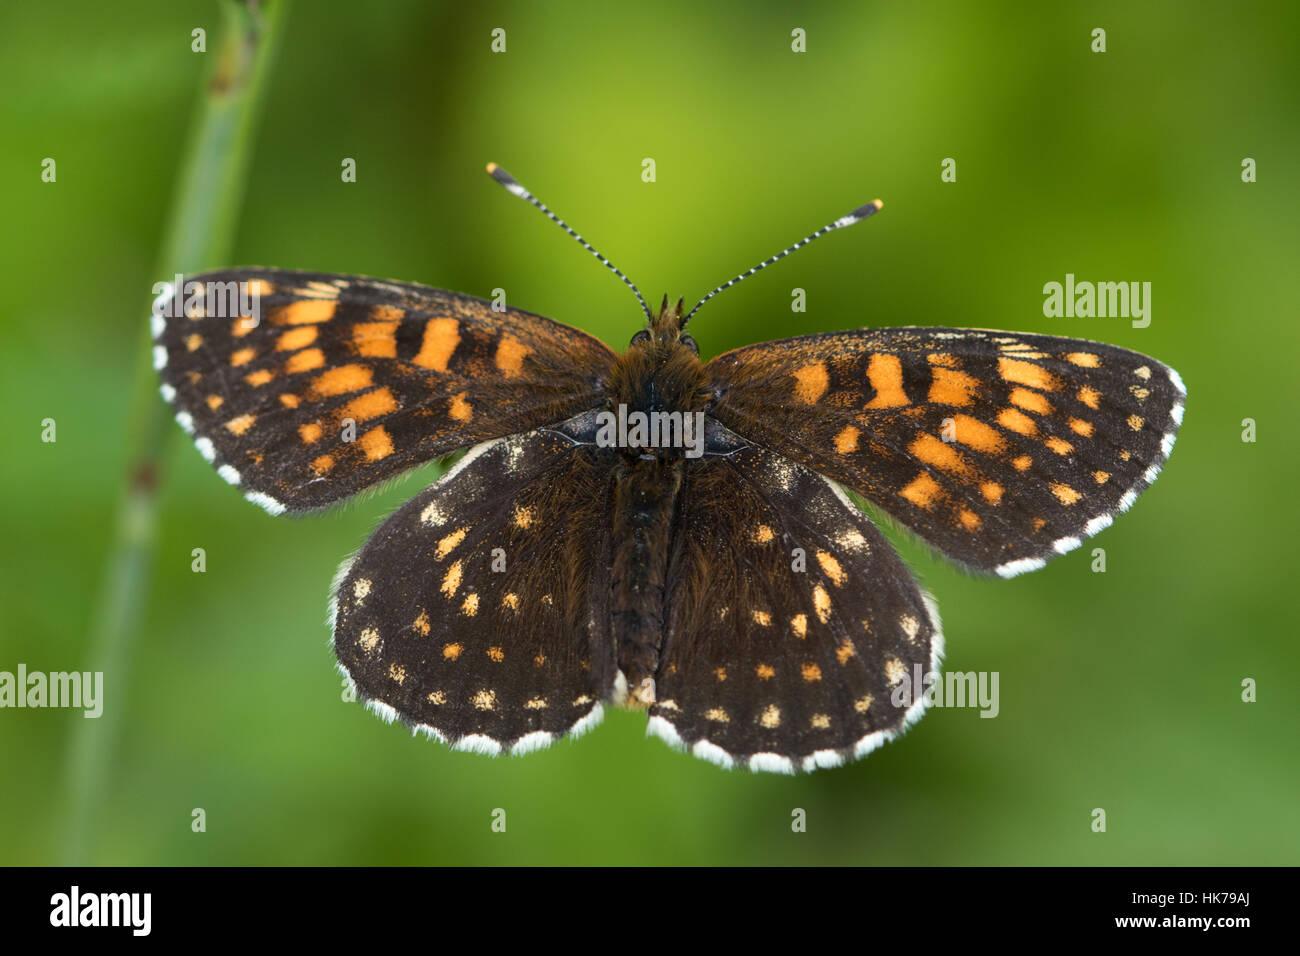 False Heath Fritillary (Melitaea diamina) butterfly basking in the sun - Stock Image